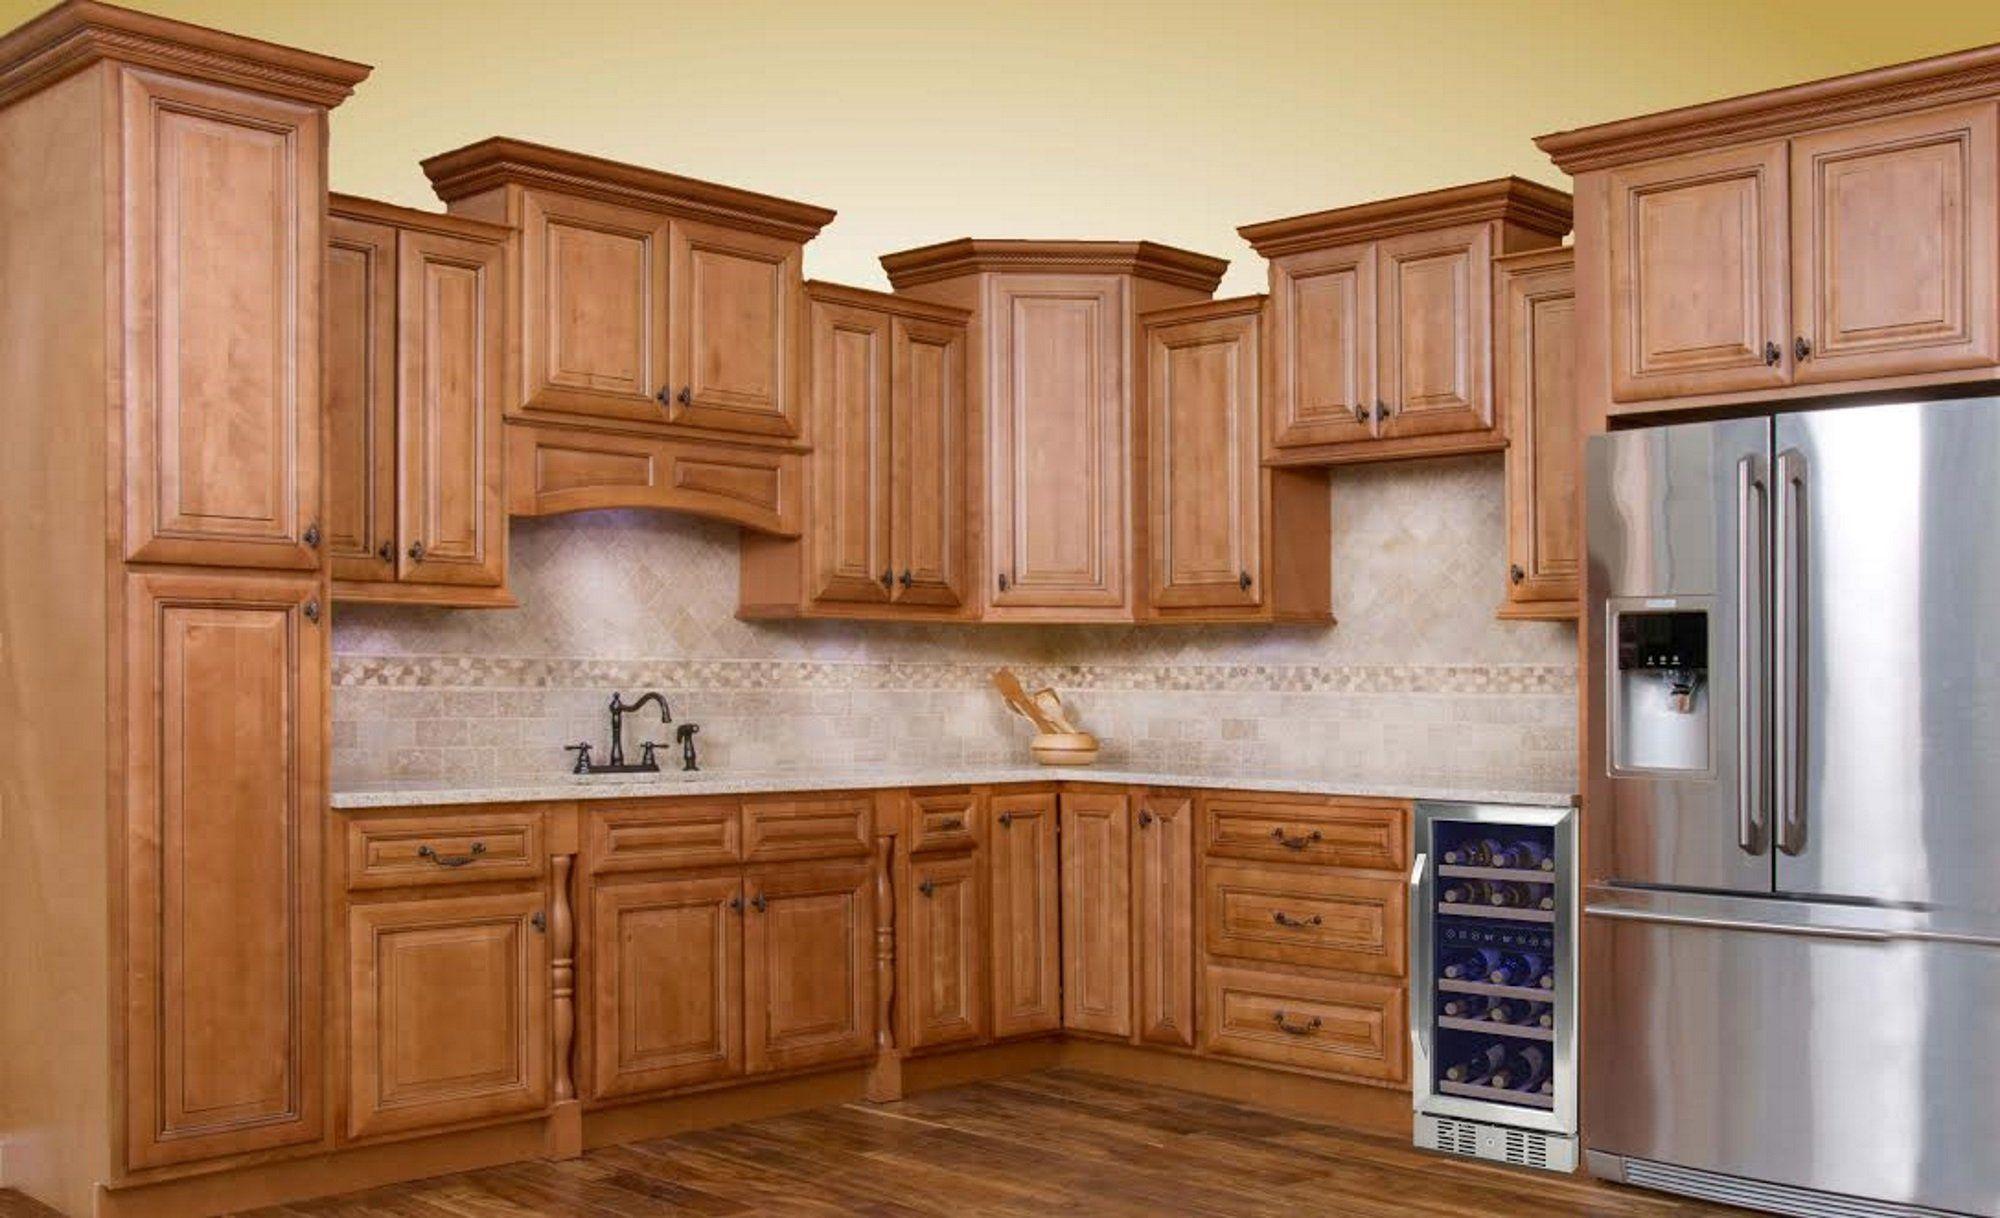 34 Luxury Farmhouse Kitchen Design Ideas To Bring Modern Look Trendehouse Kitchen Cabinet Styles Kitchen Renovation Cost Kitchen Cabinet Design